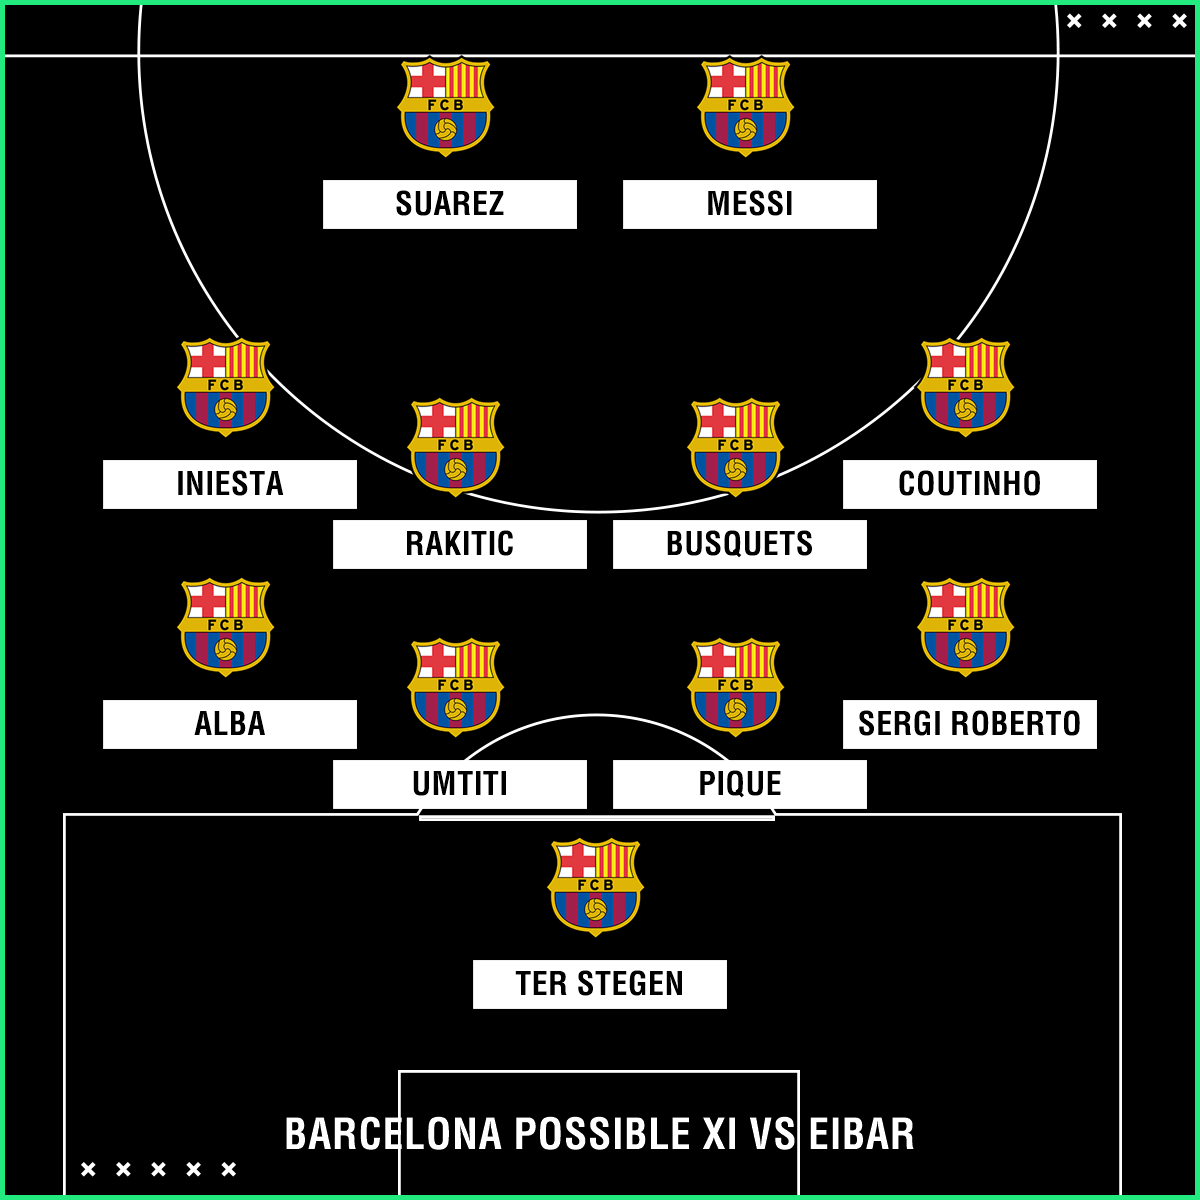 Barcelona possible Eibar